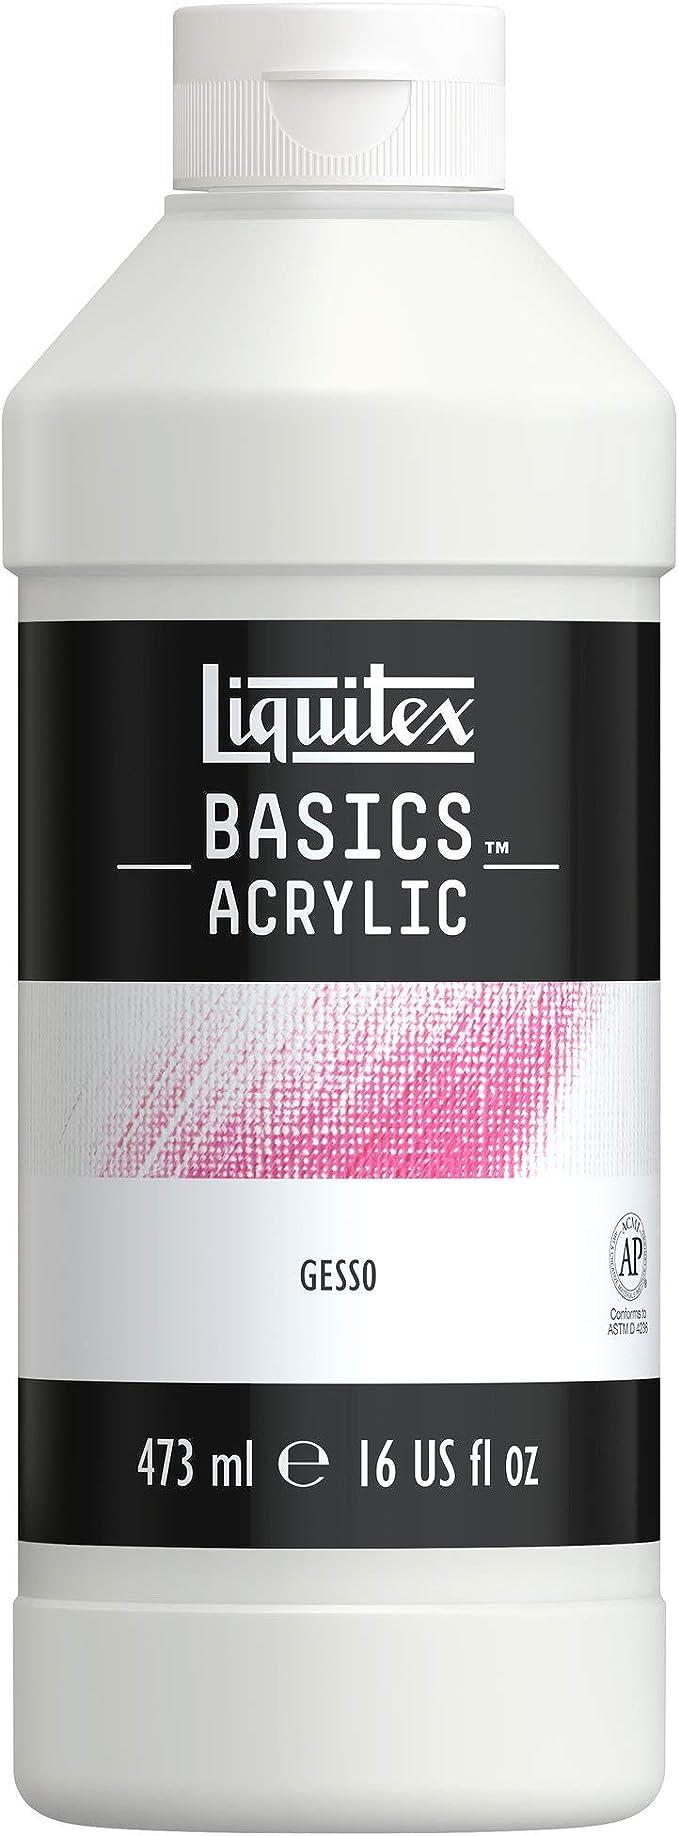 Amazon.com: Liquitex BASICS Gesso Surface Prep Medium Tube, 16oz